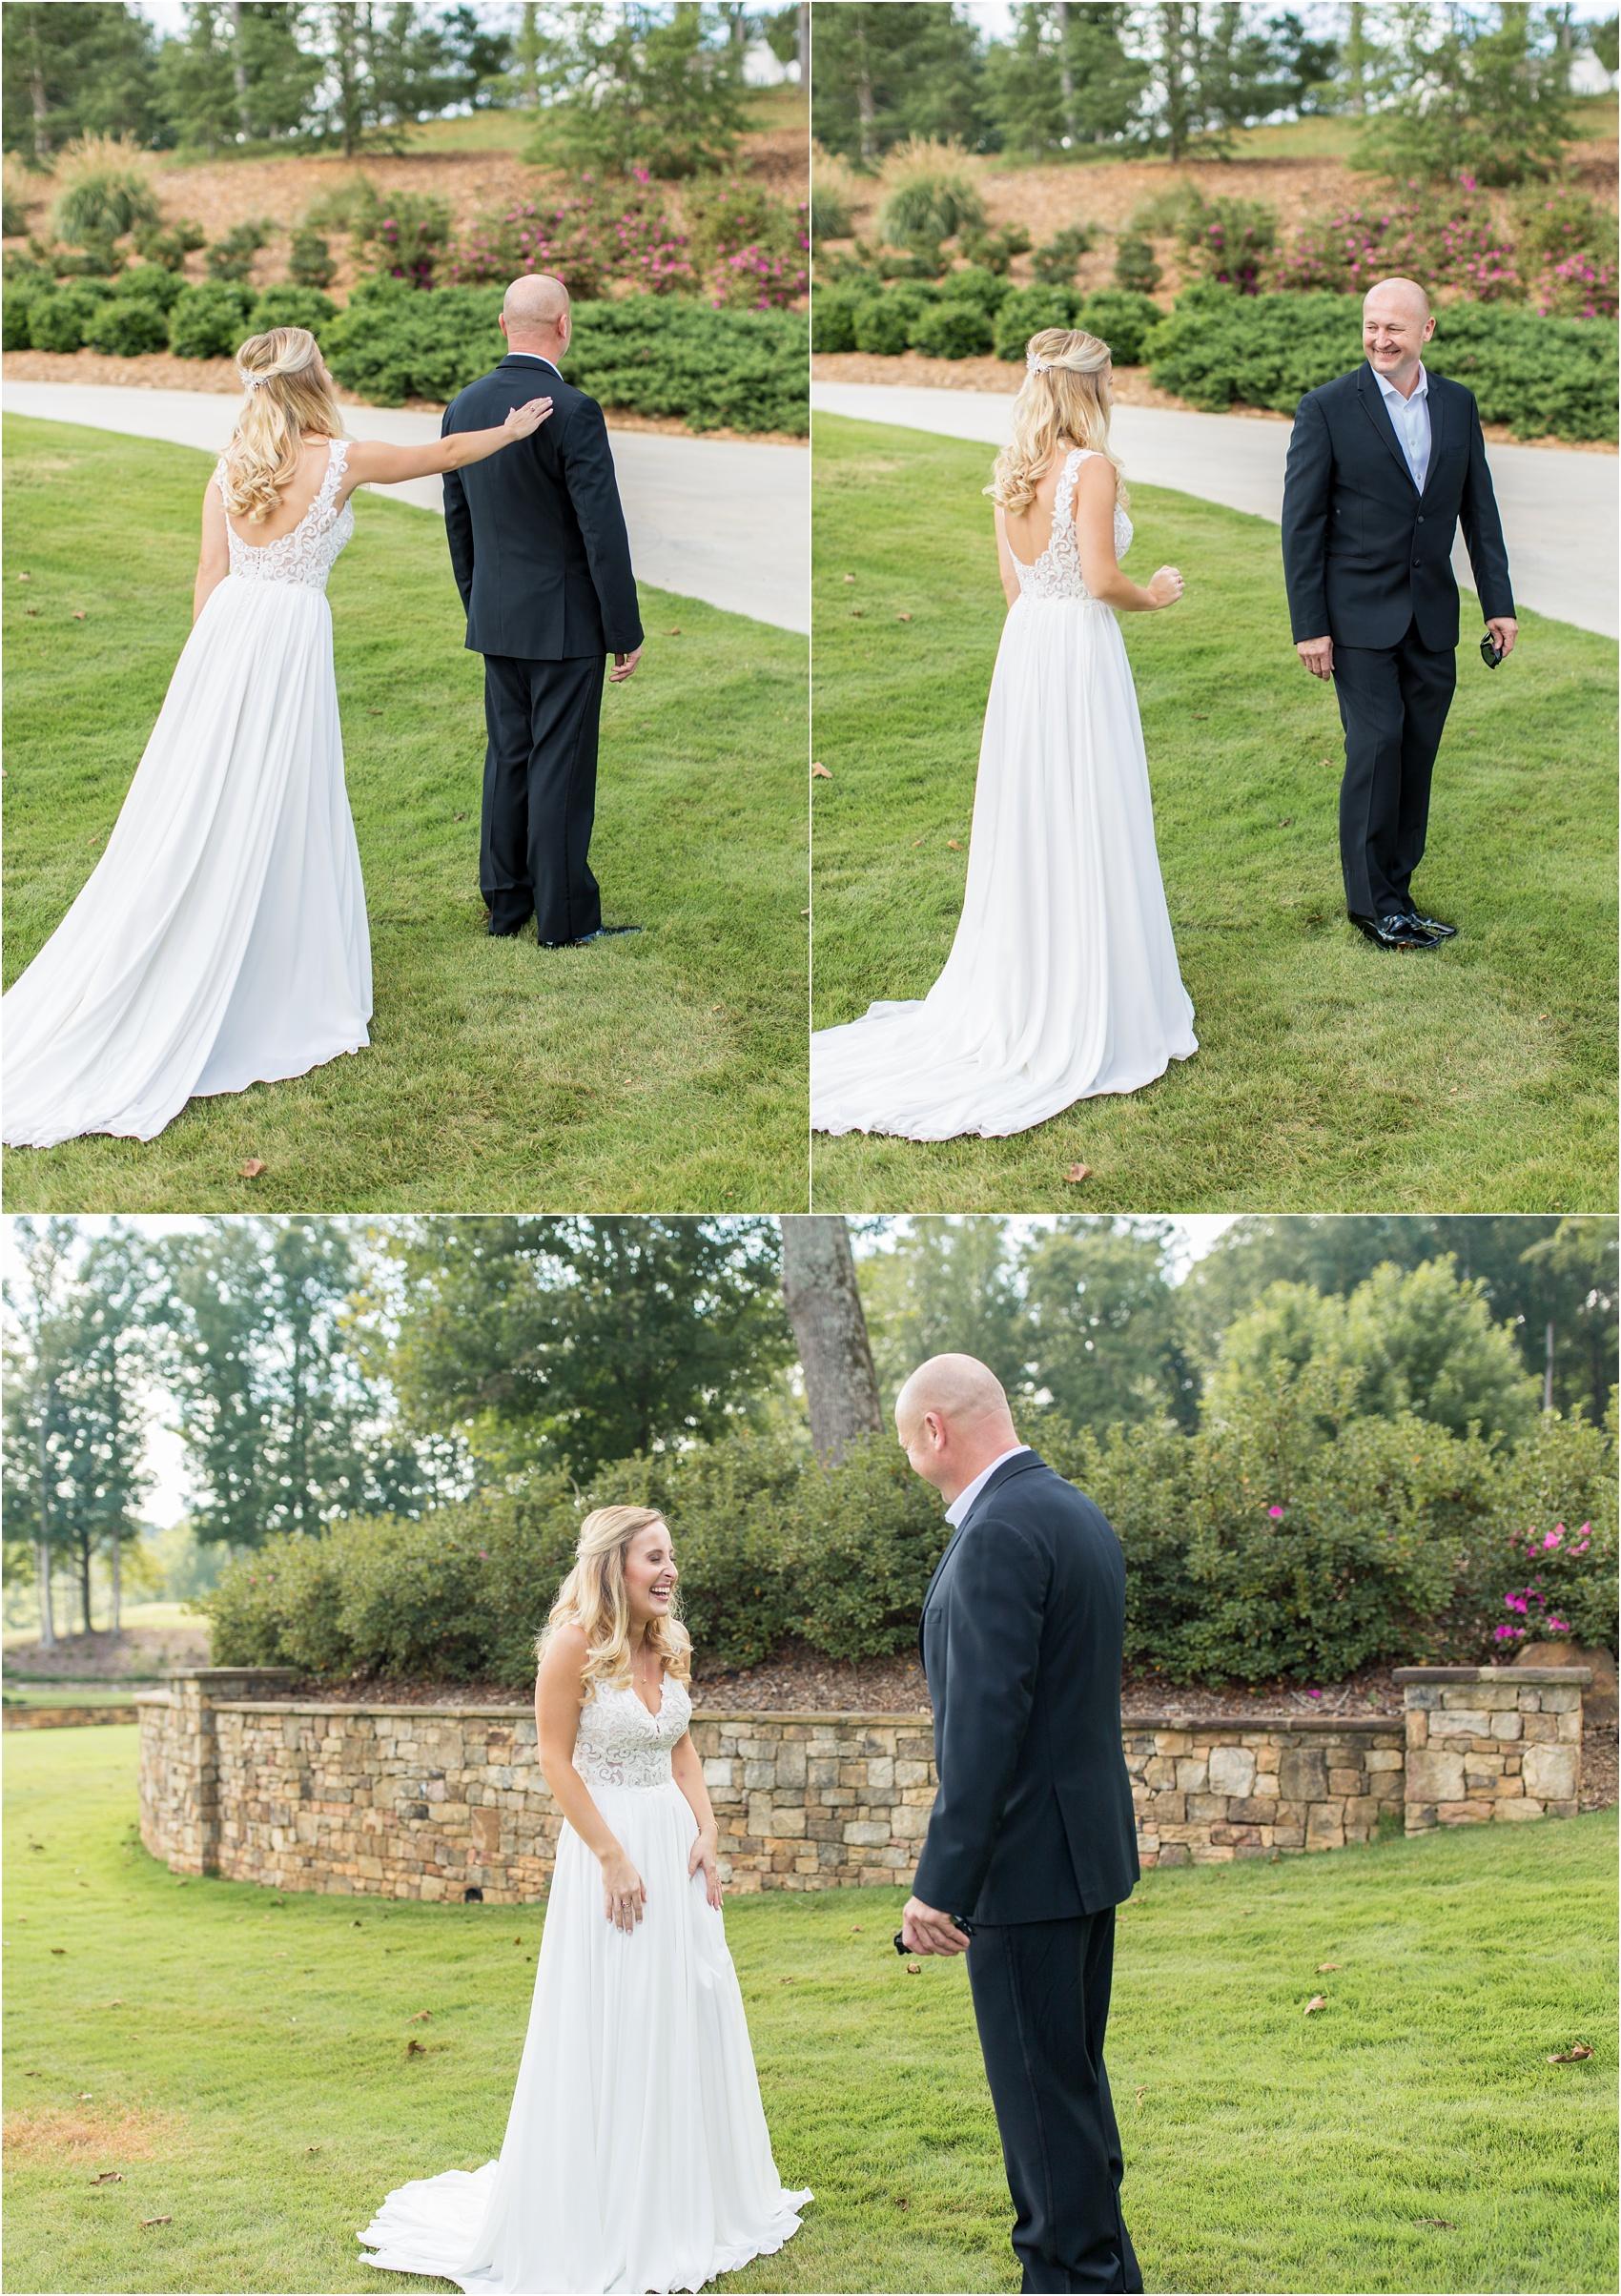 Savannah Eve Photography- Jurek-Woodworth Wedding- Sneak Peek-11.jpg